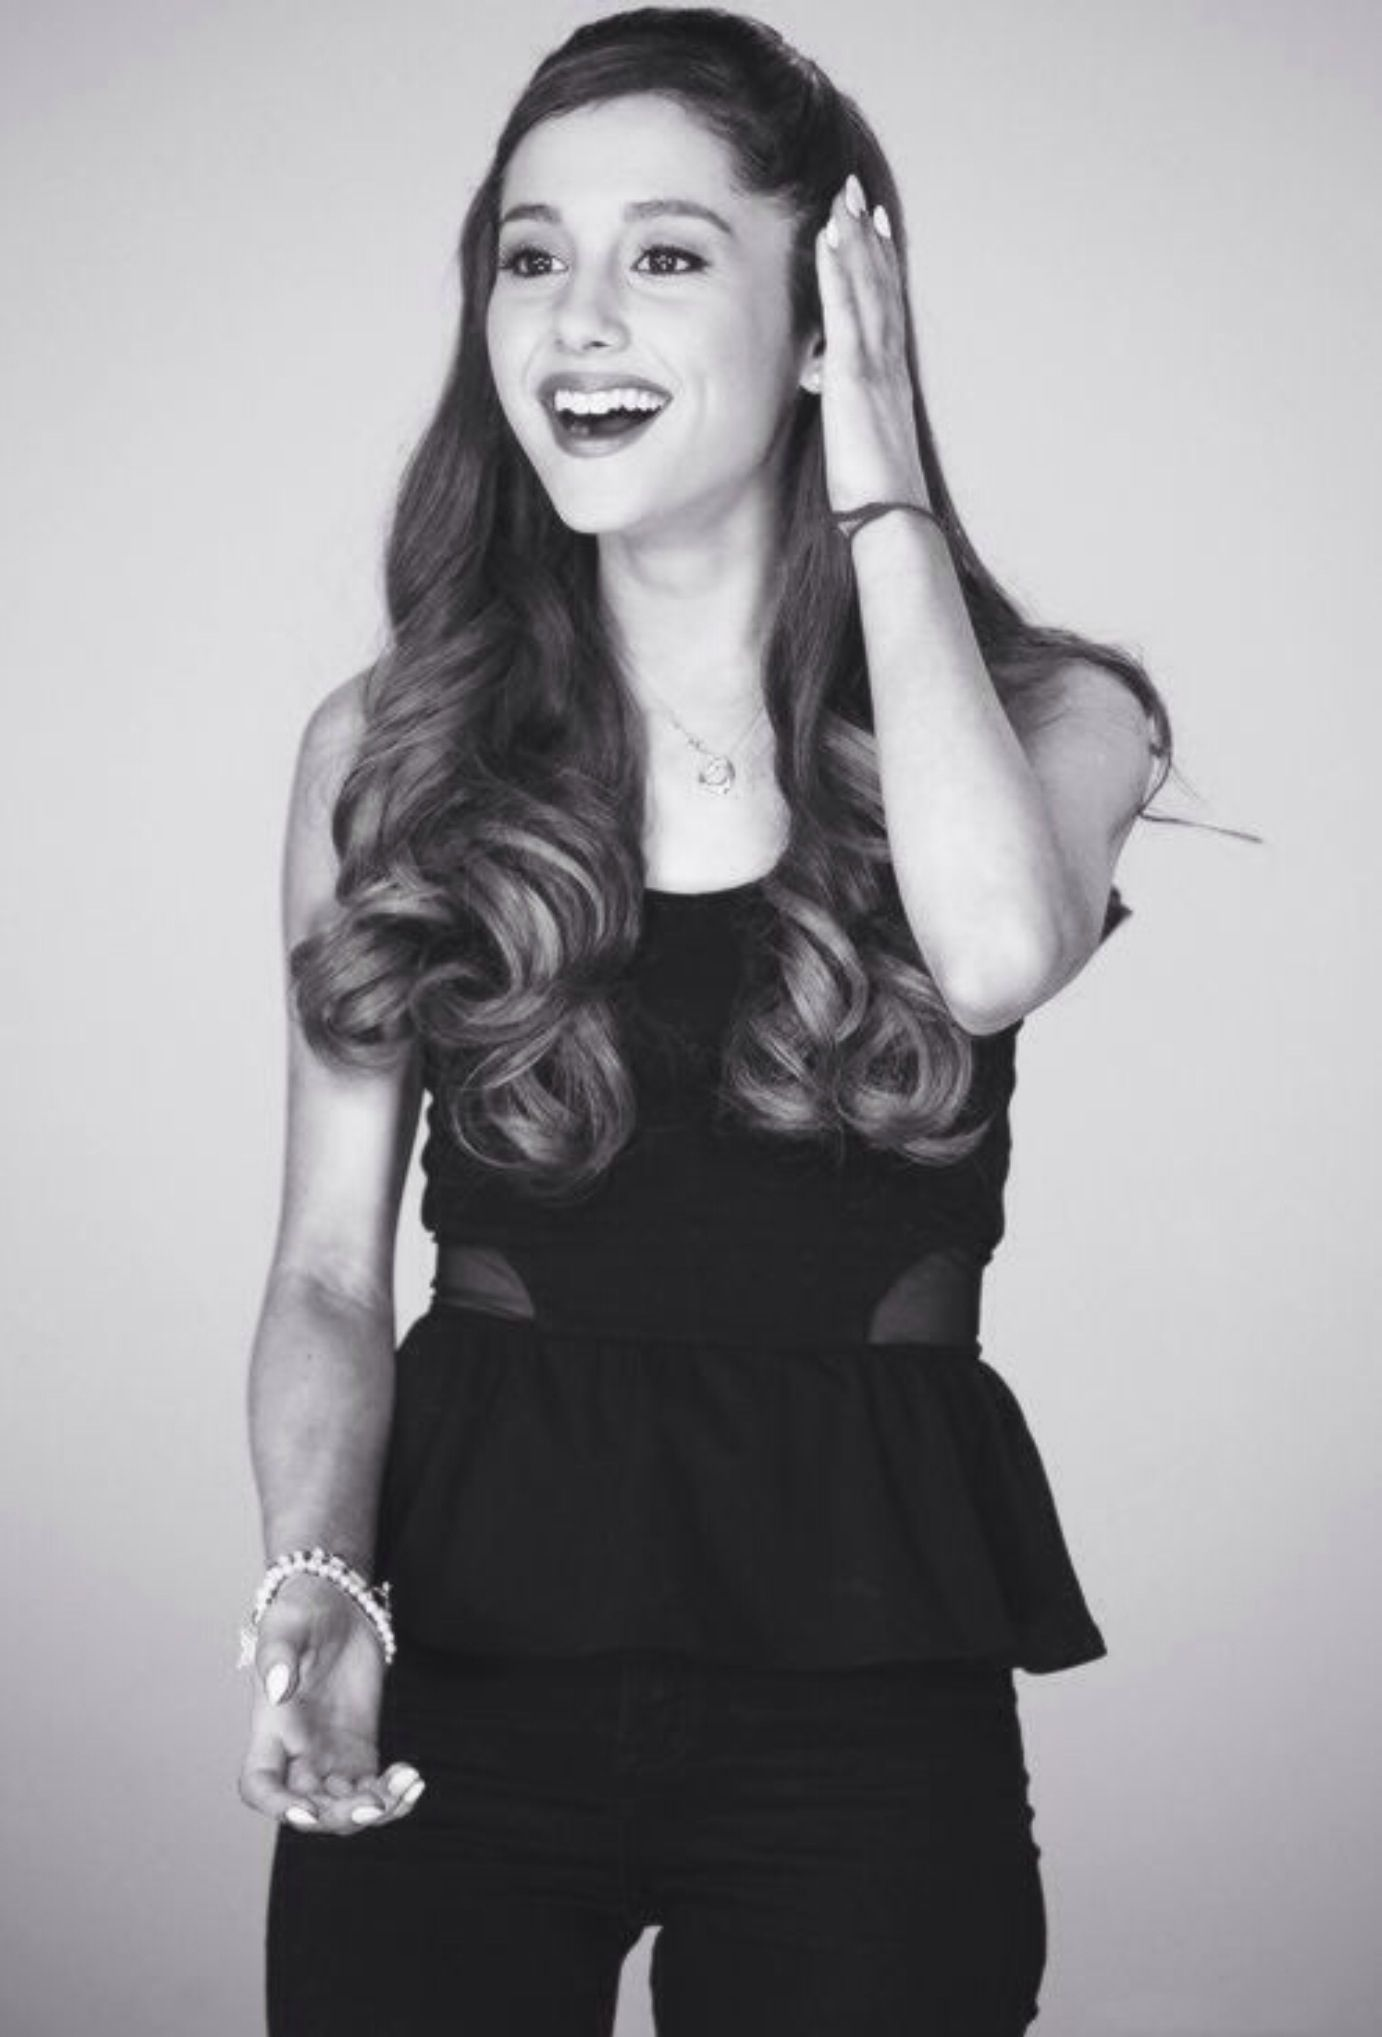 Ariana grande's hair is far too bomb